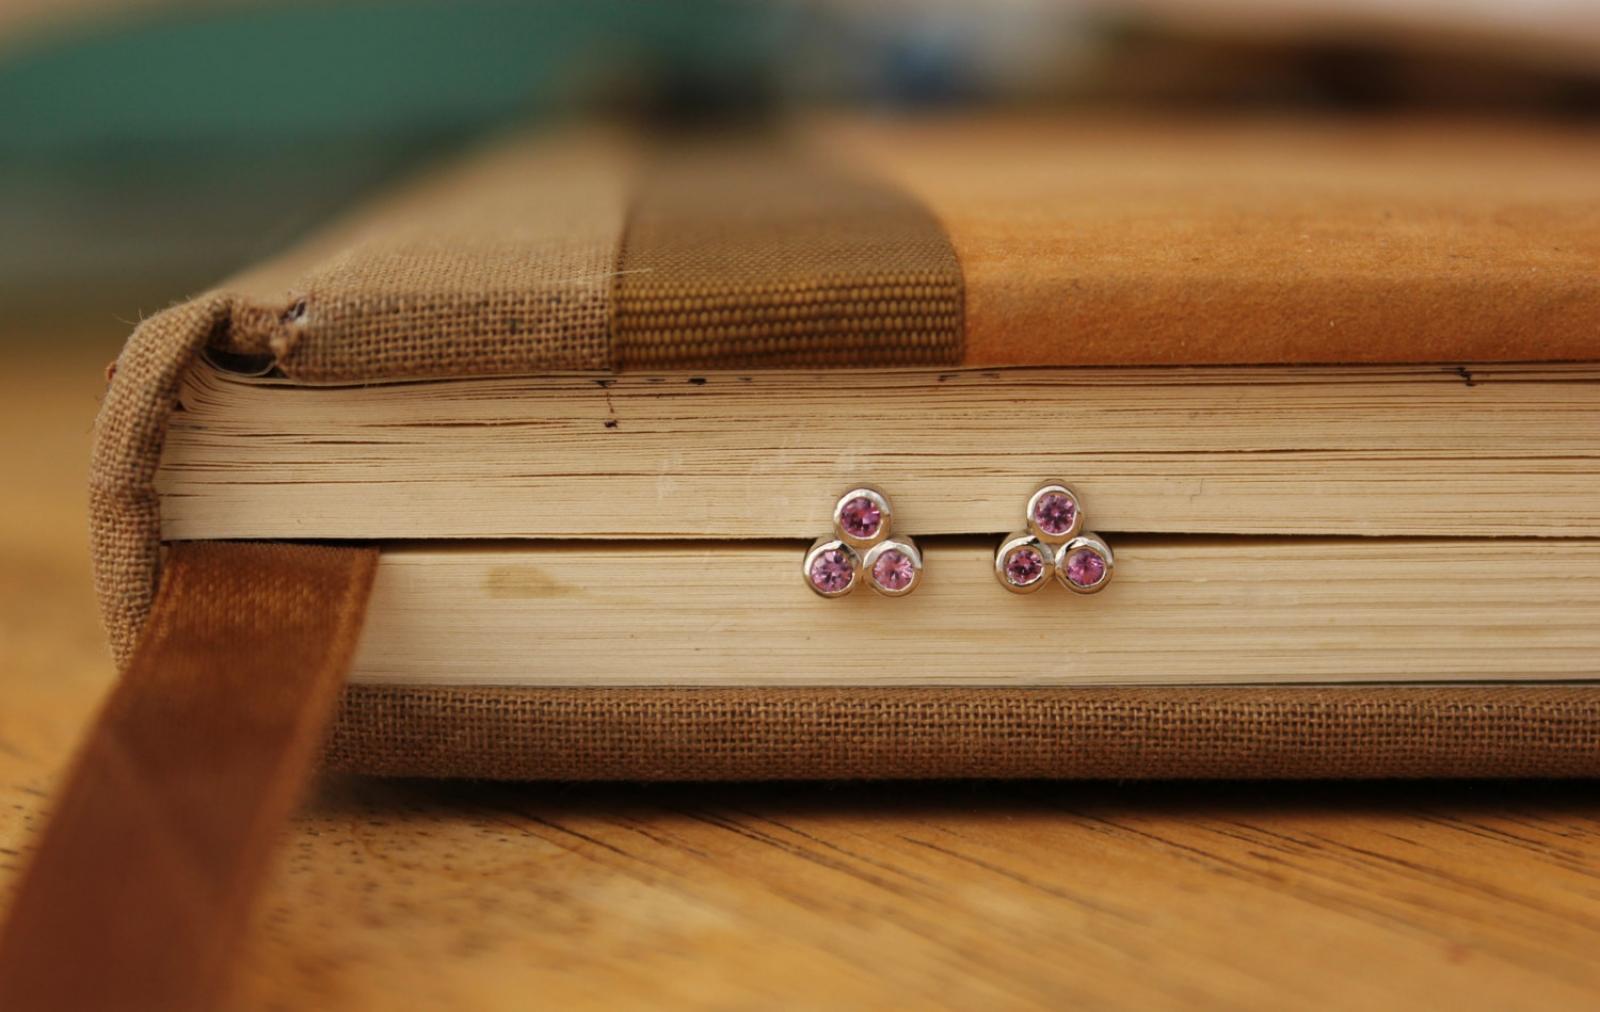 0d9b6db96 Pink Sapphire Three Stone Studs, 14k White Gold Studs, Pink Gemstone  Earrings, Pink Trio Studs, Ready to Ship | Theresa Pytell | Jewelry Design